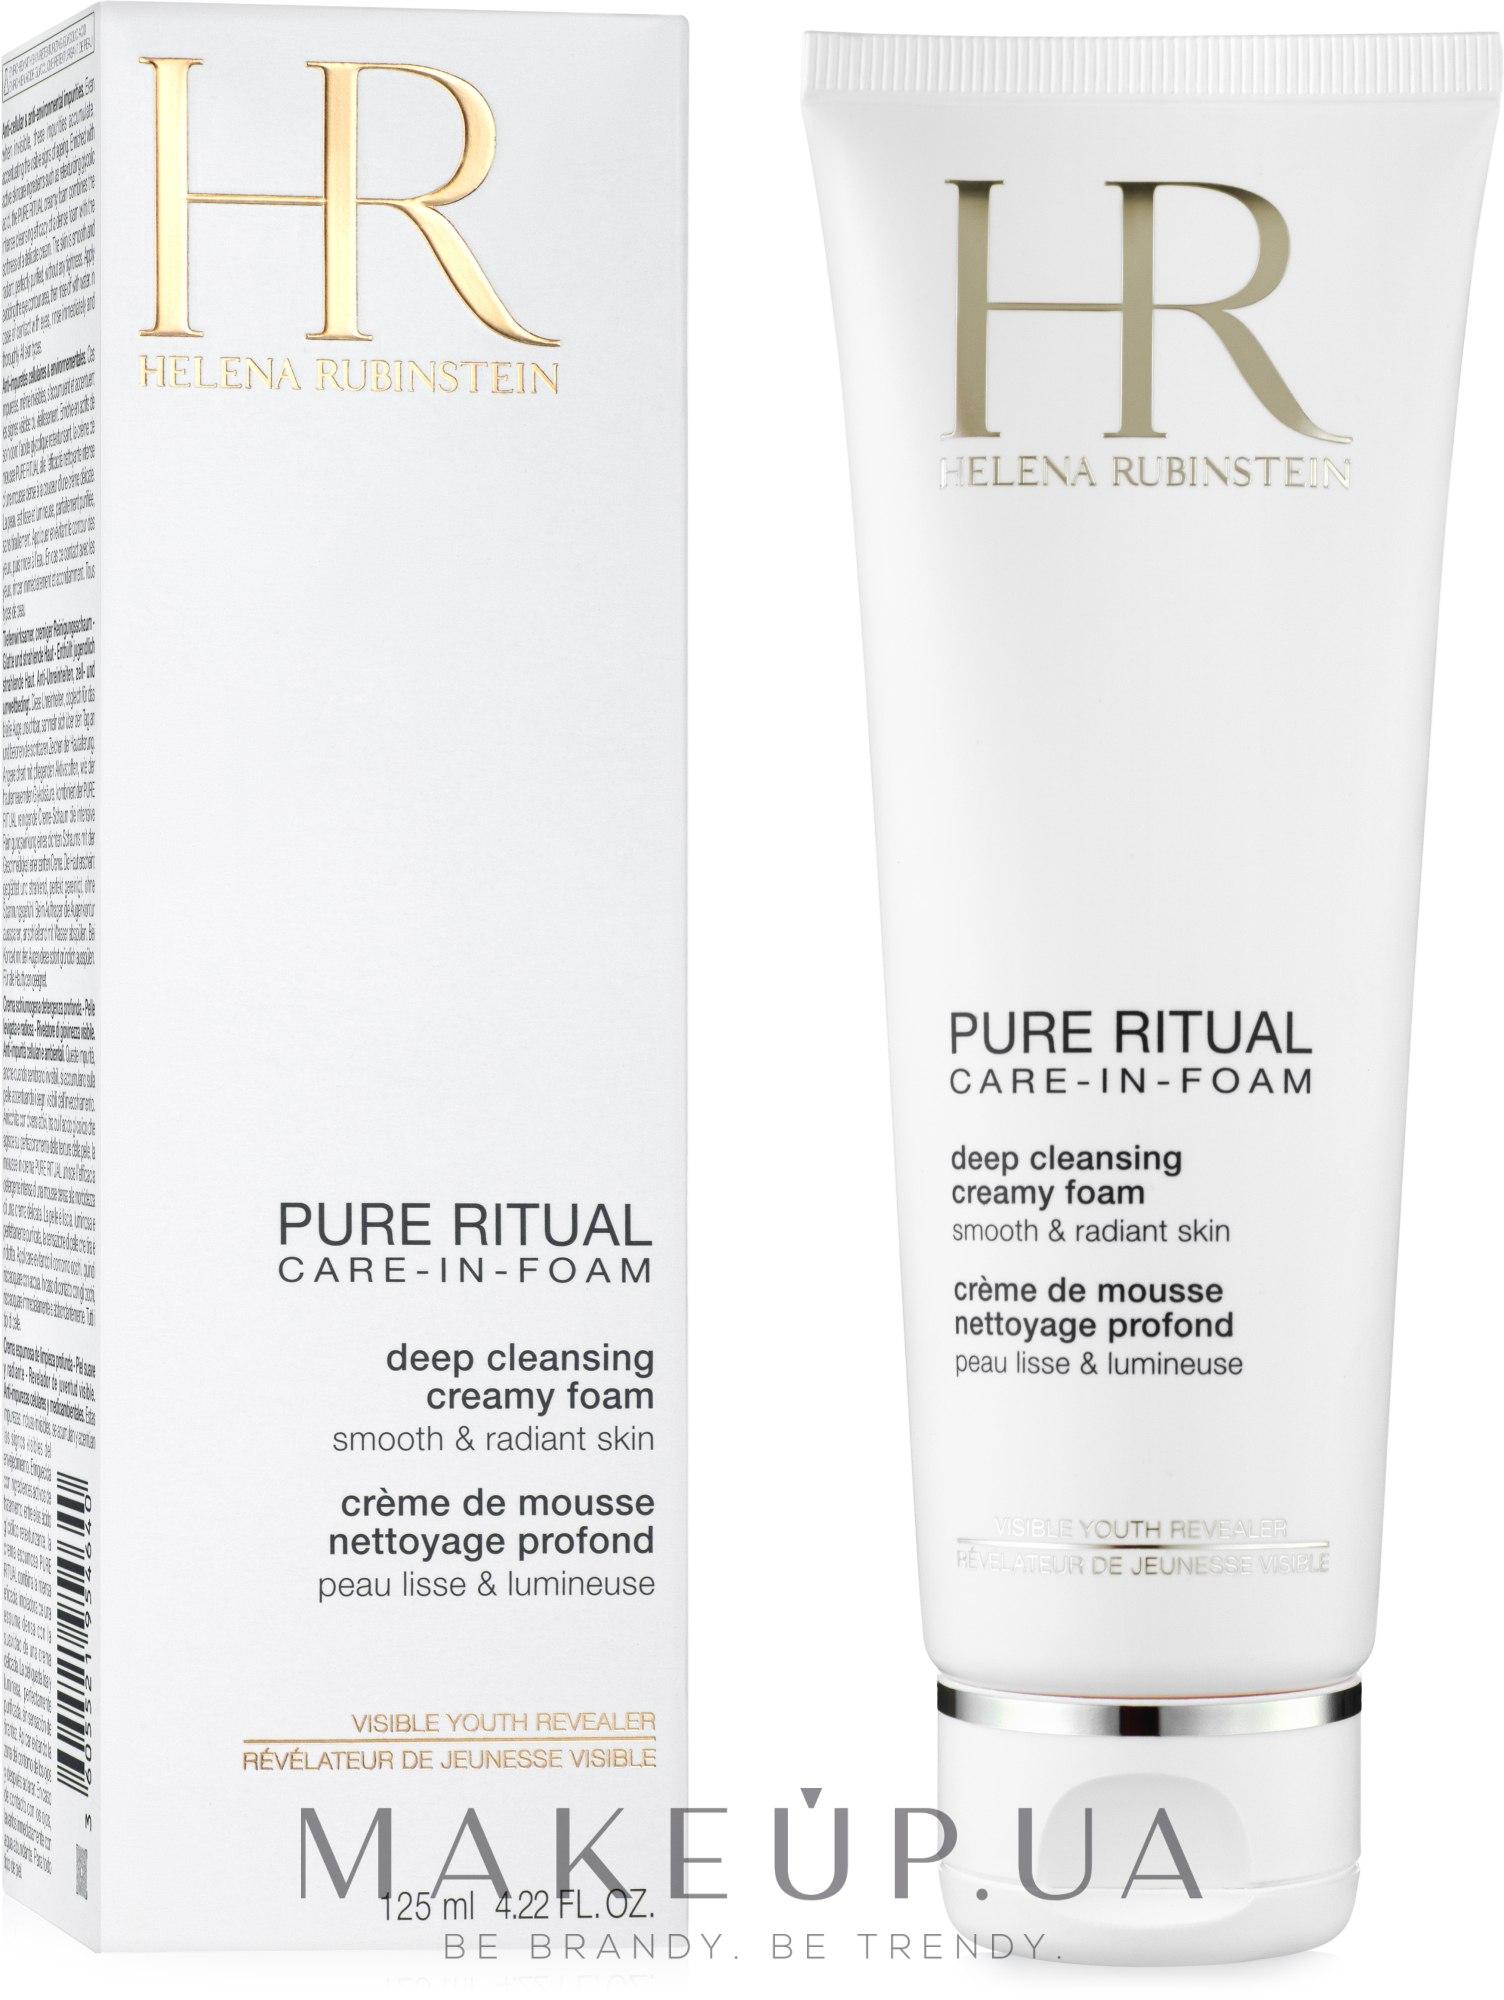 Глубоко очищающая кремовая пенка - Helena Rubinstein Pure Ritual Deep Cleansing Creamy Foam — фото 125ml